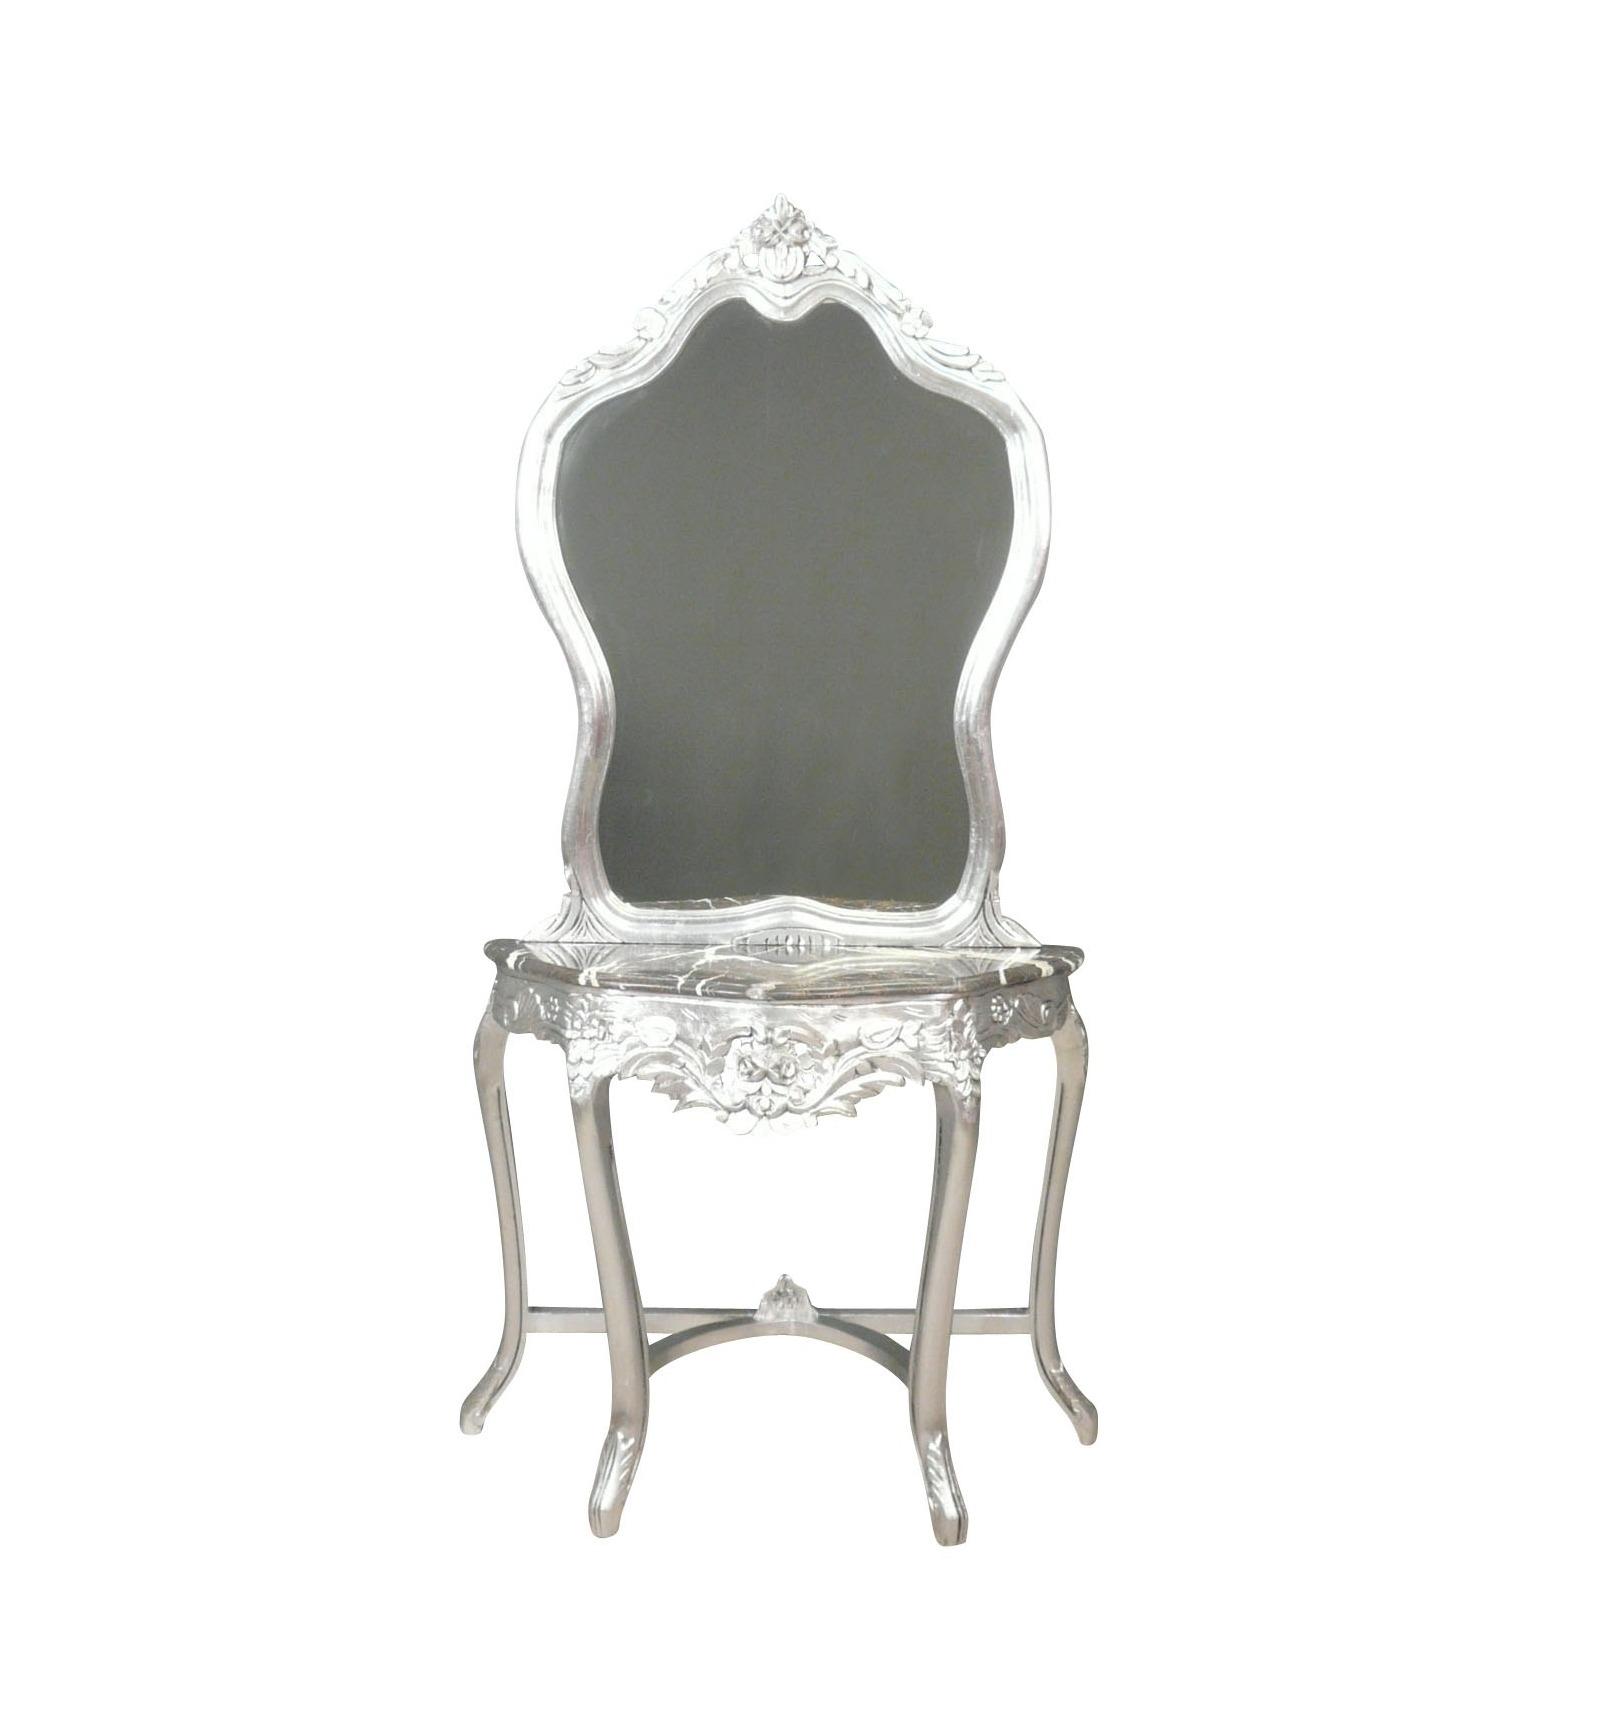 console baroque en bois argente avec son miroir